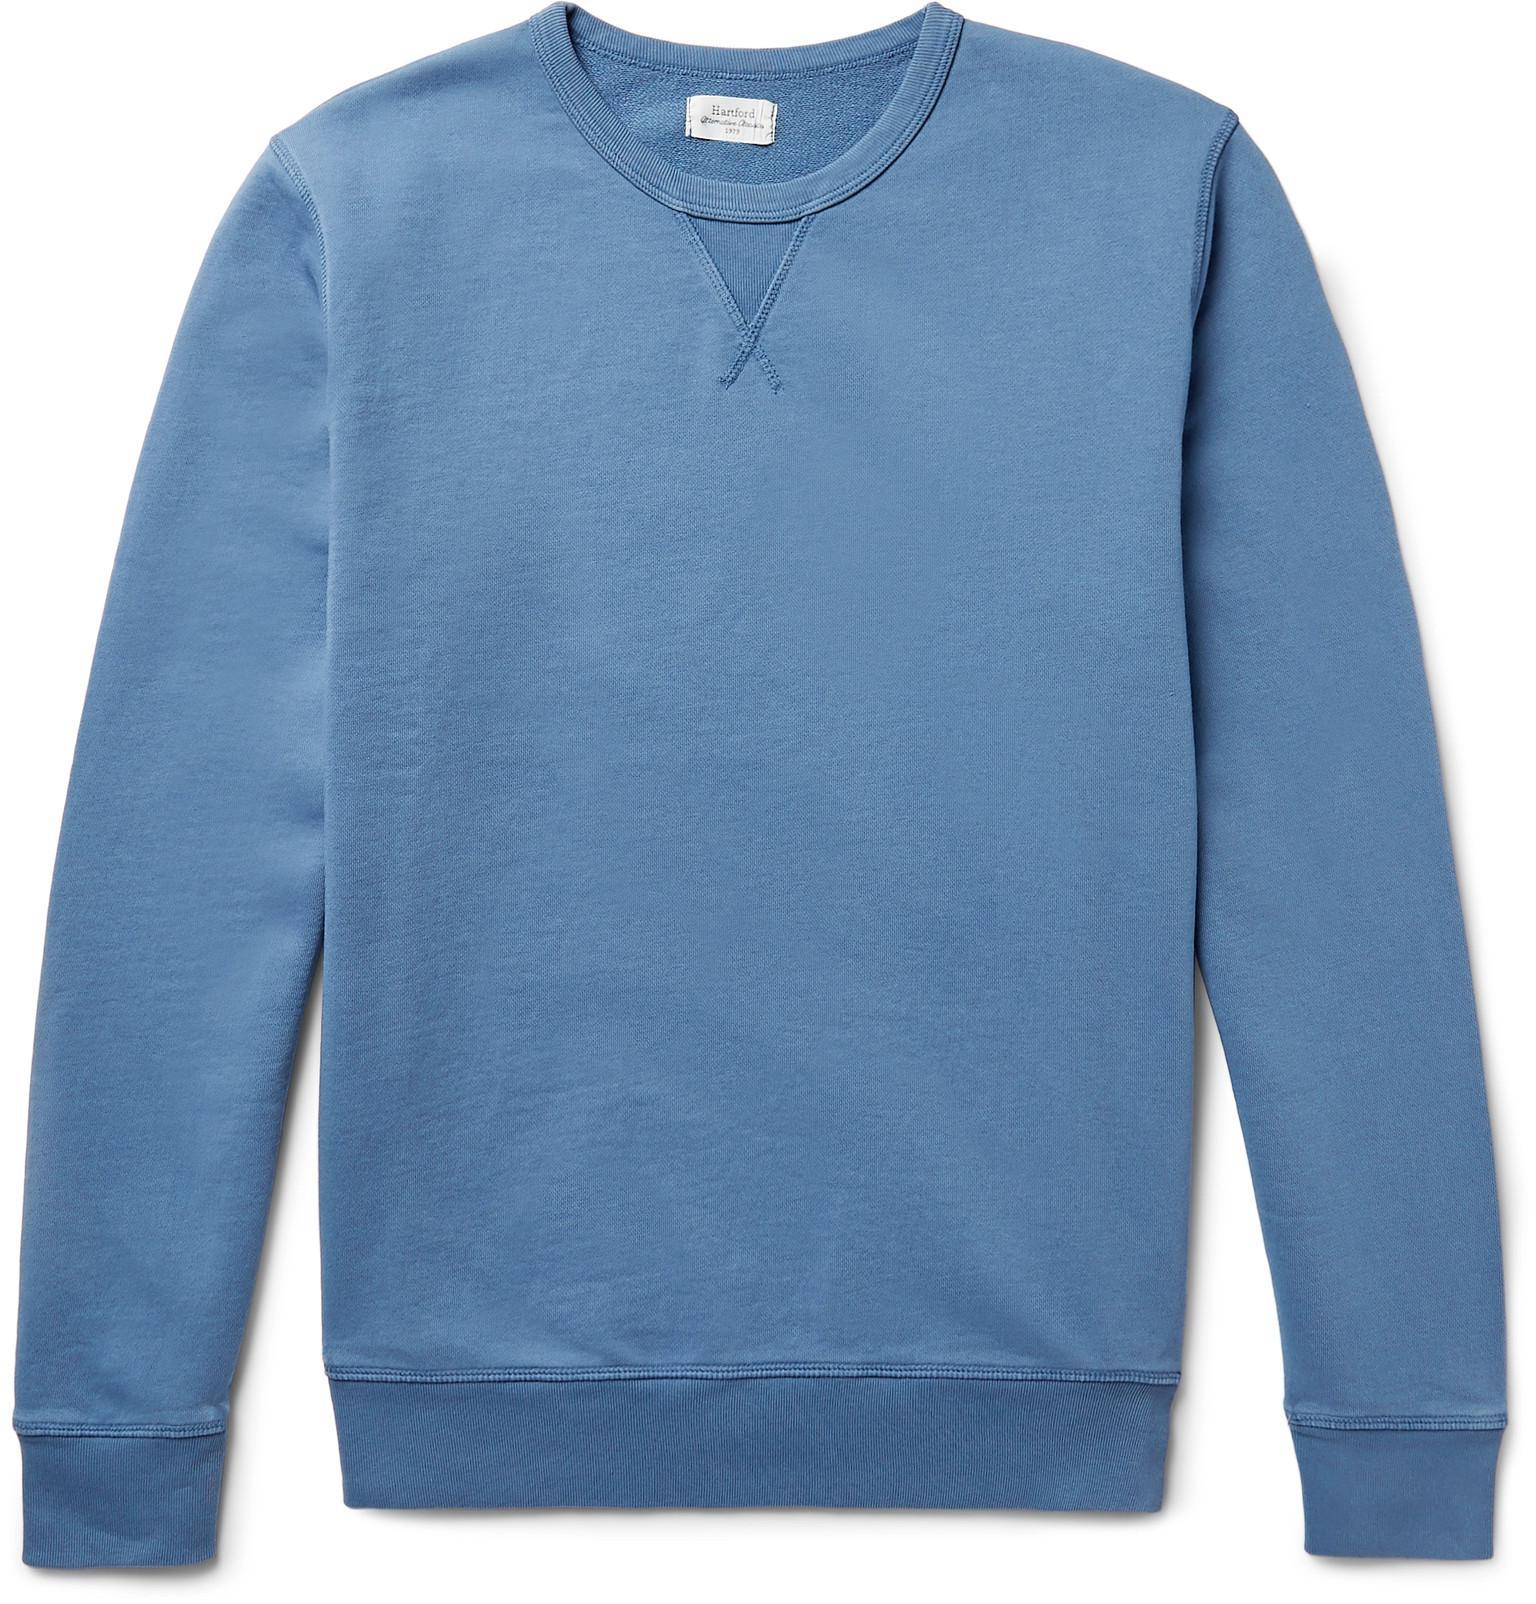 HARTFORD Loopback Cotton-jersey Half-zip Sweatshirt - Storm blue LWAia